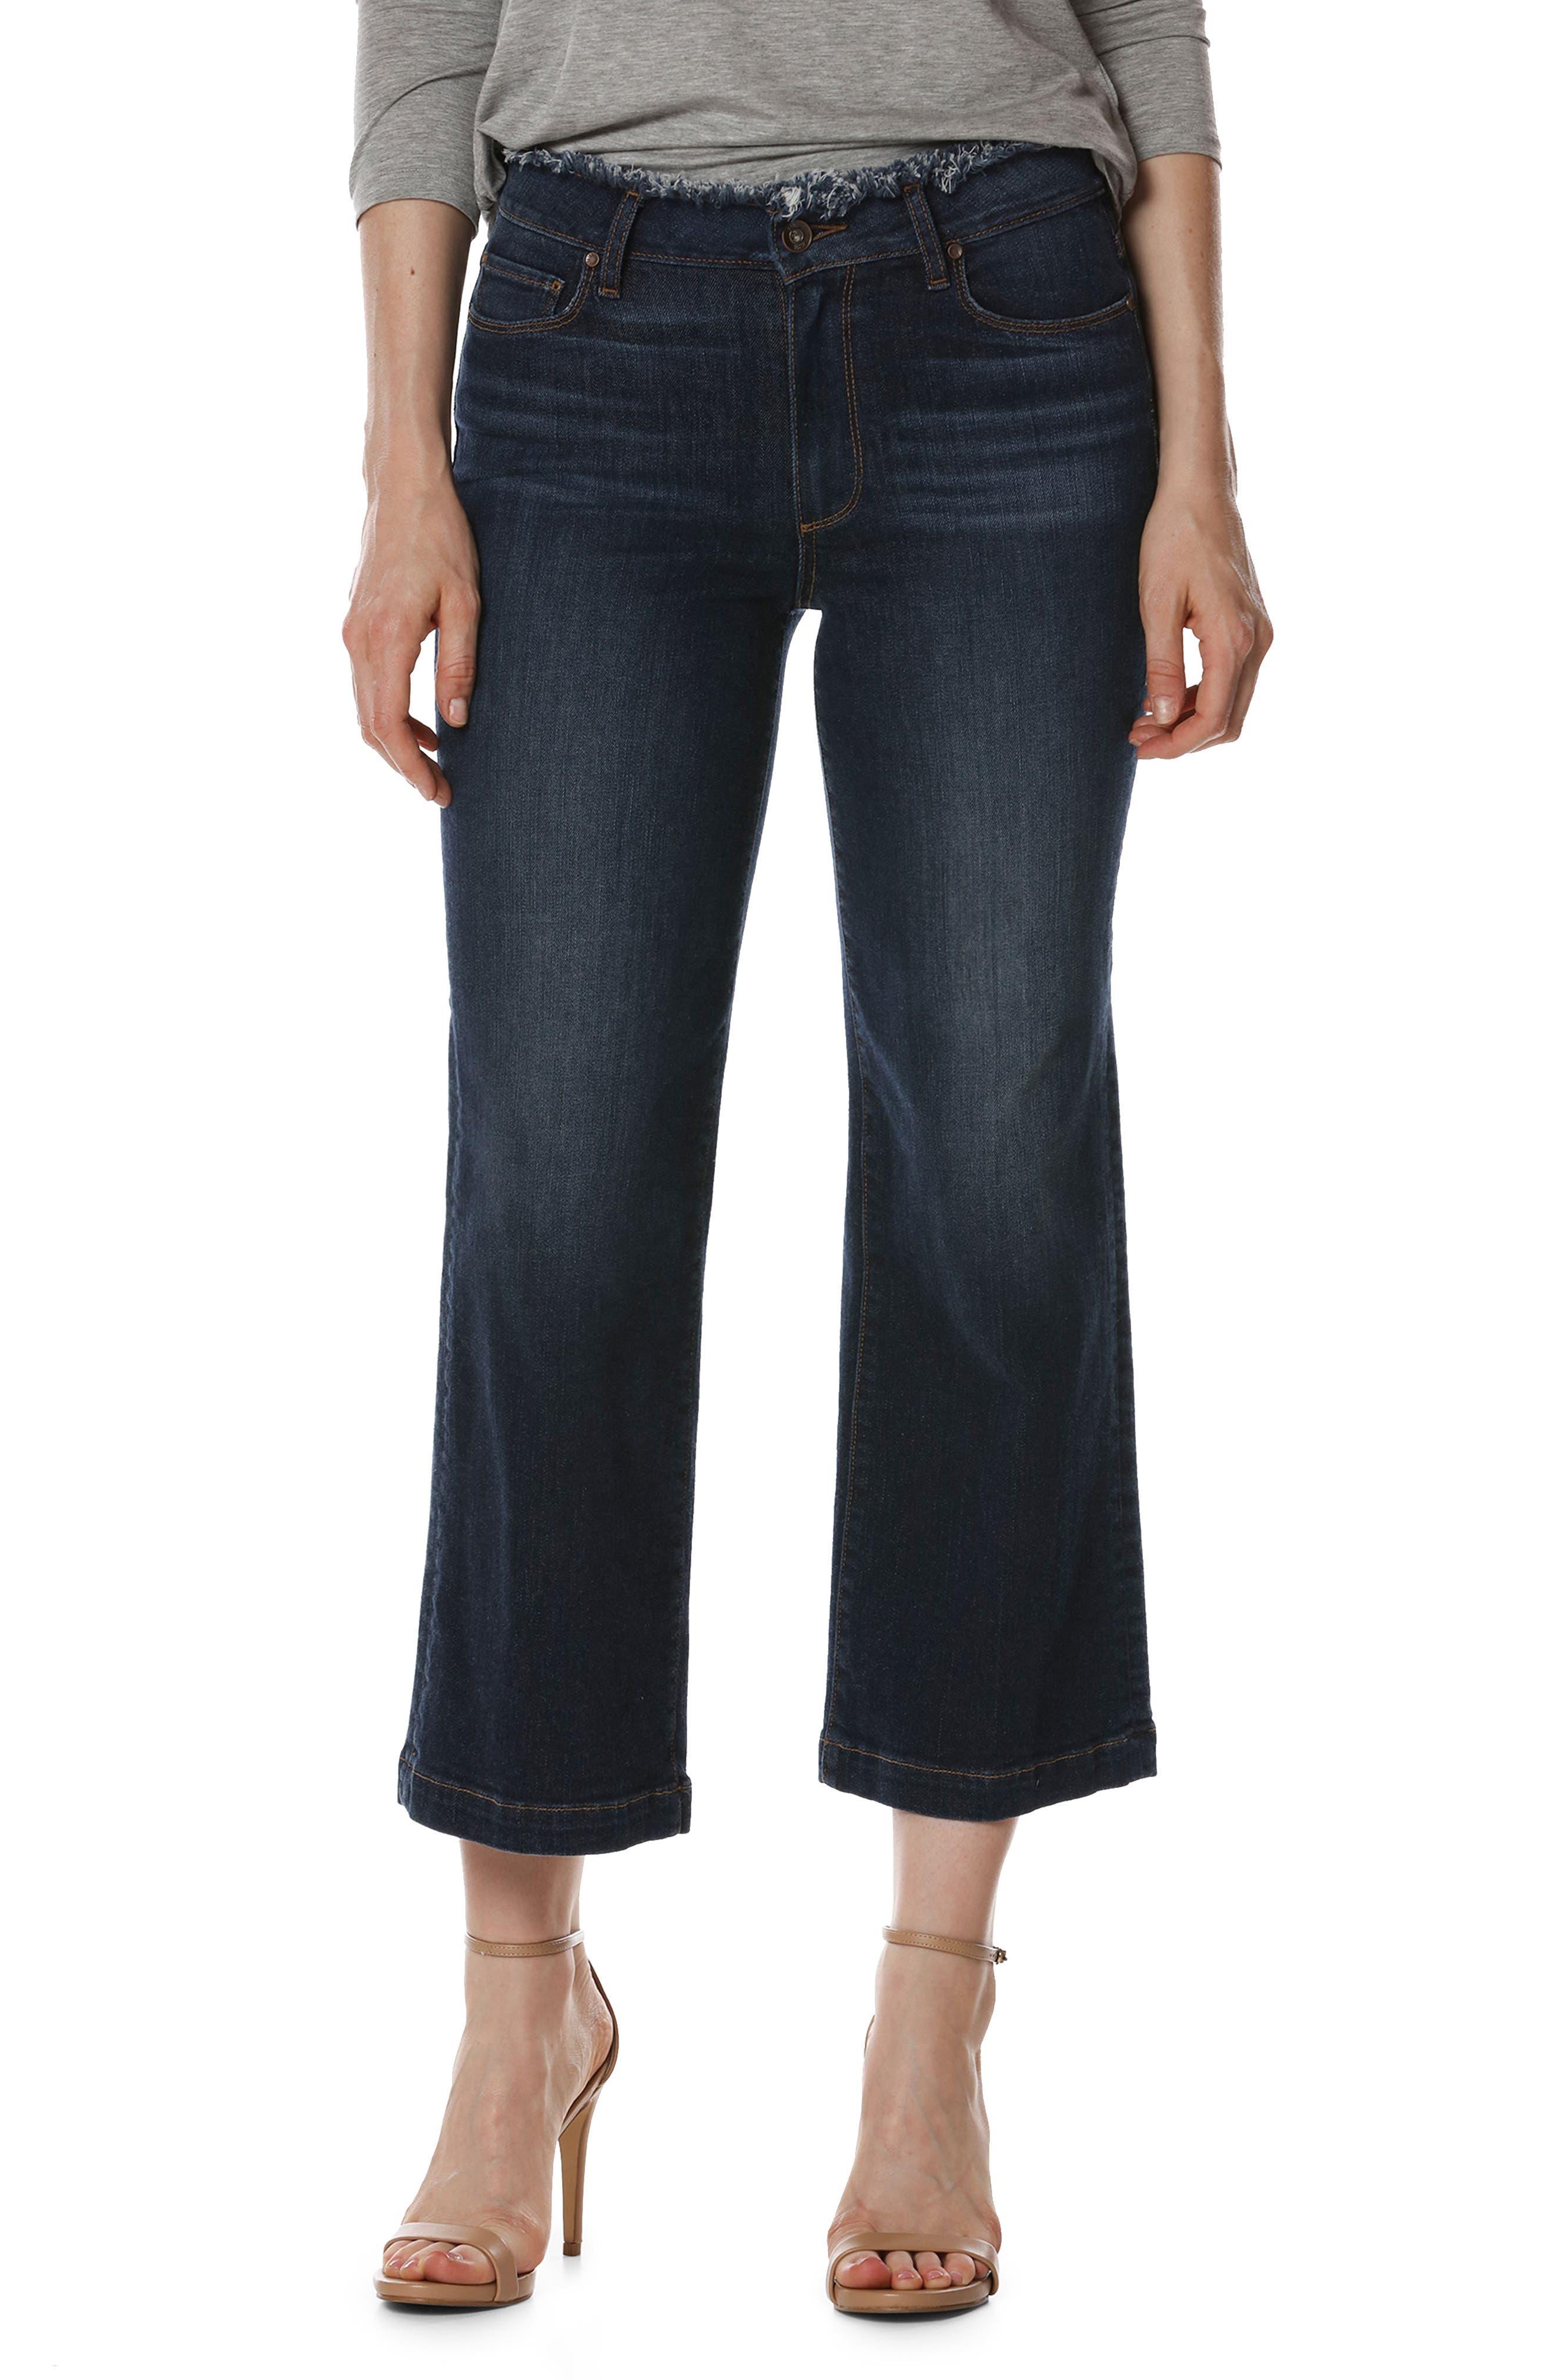 PAIGE Lori Crop Wide Leg Jeans